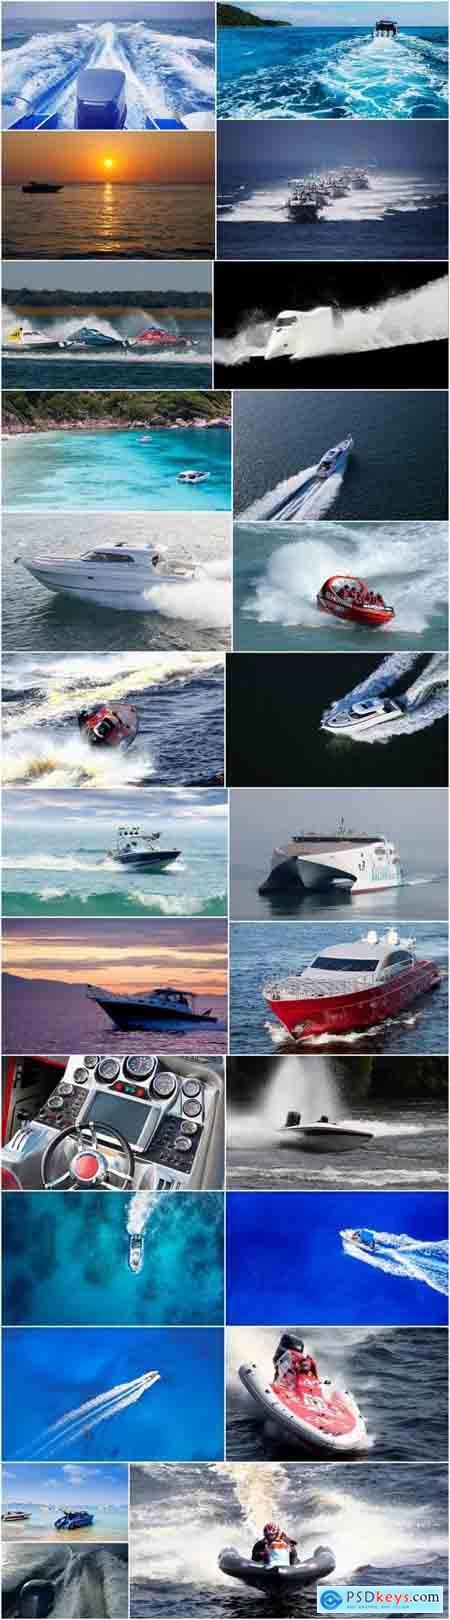 Motorboat yacht schooner sea ship travel vacation 25 HQ Jpeg